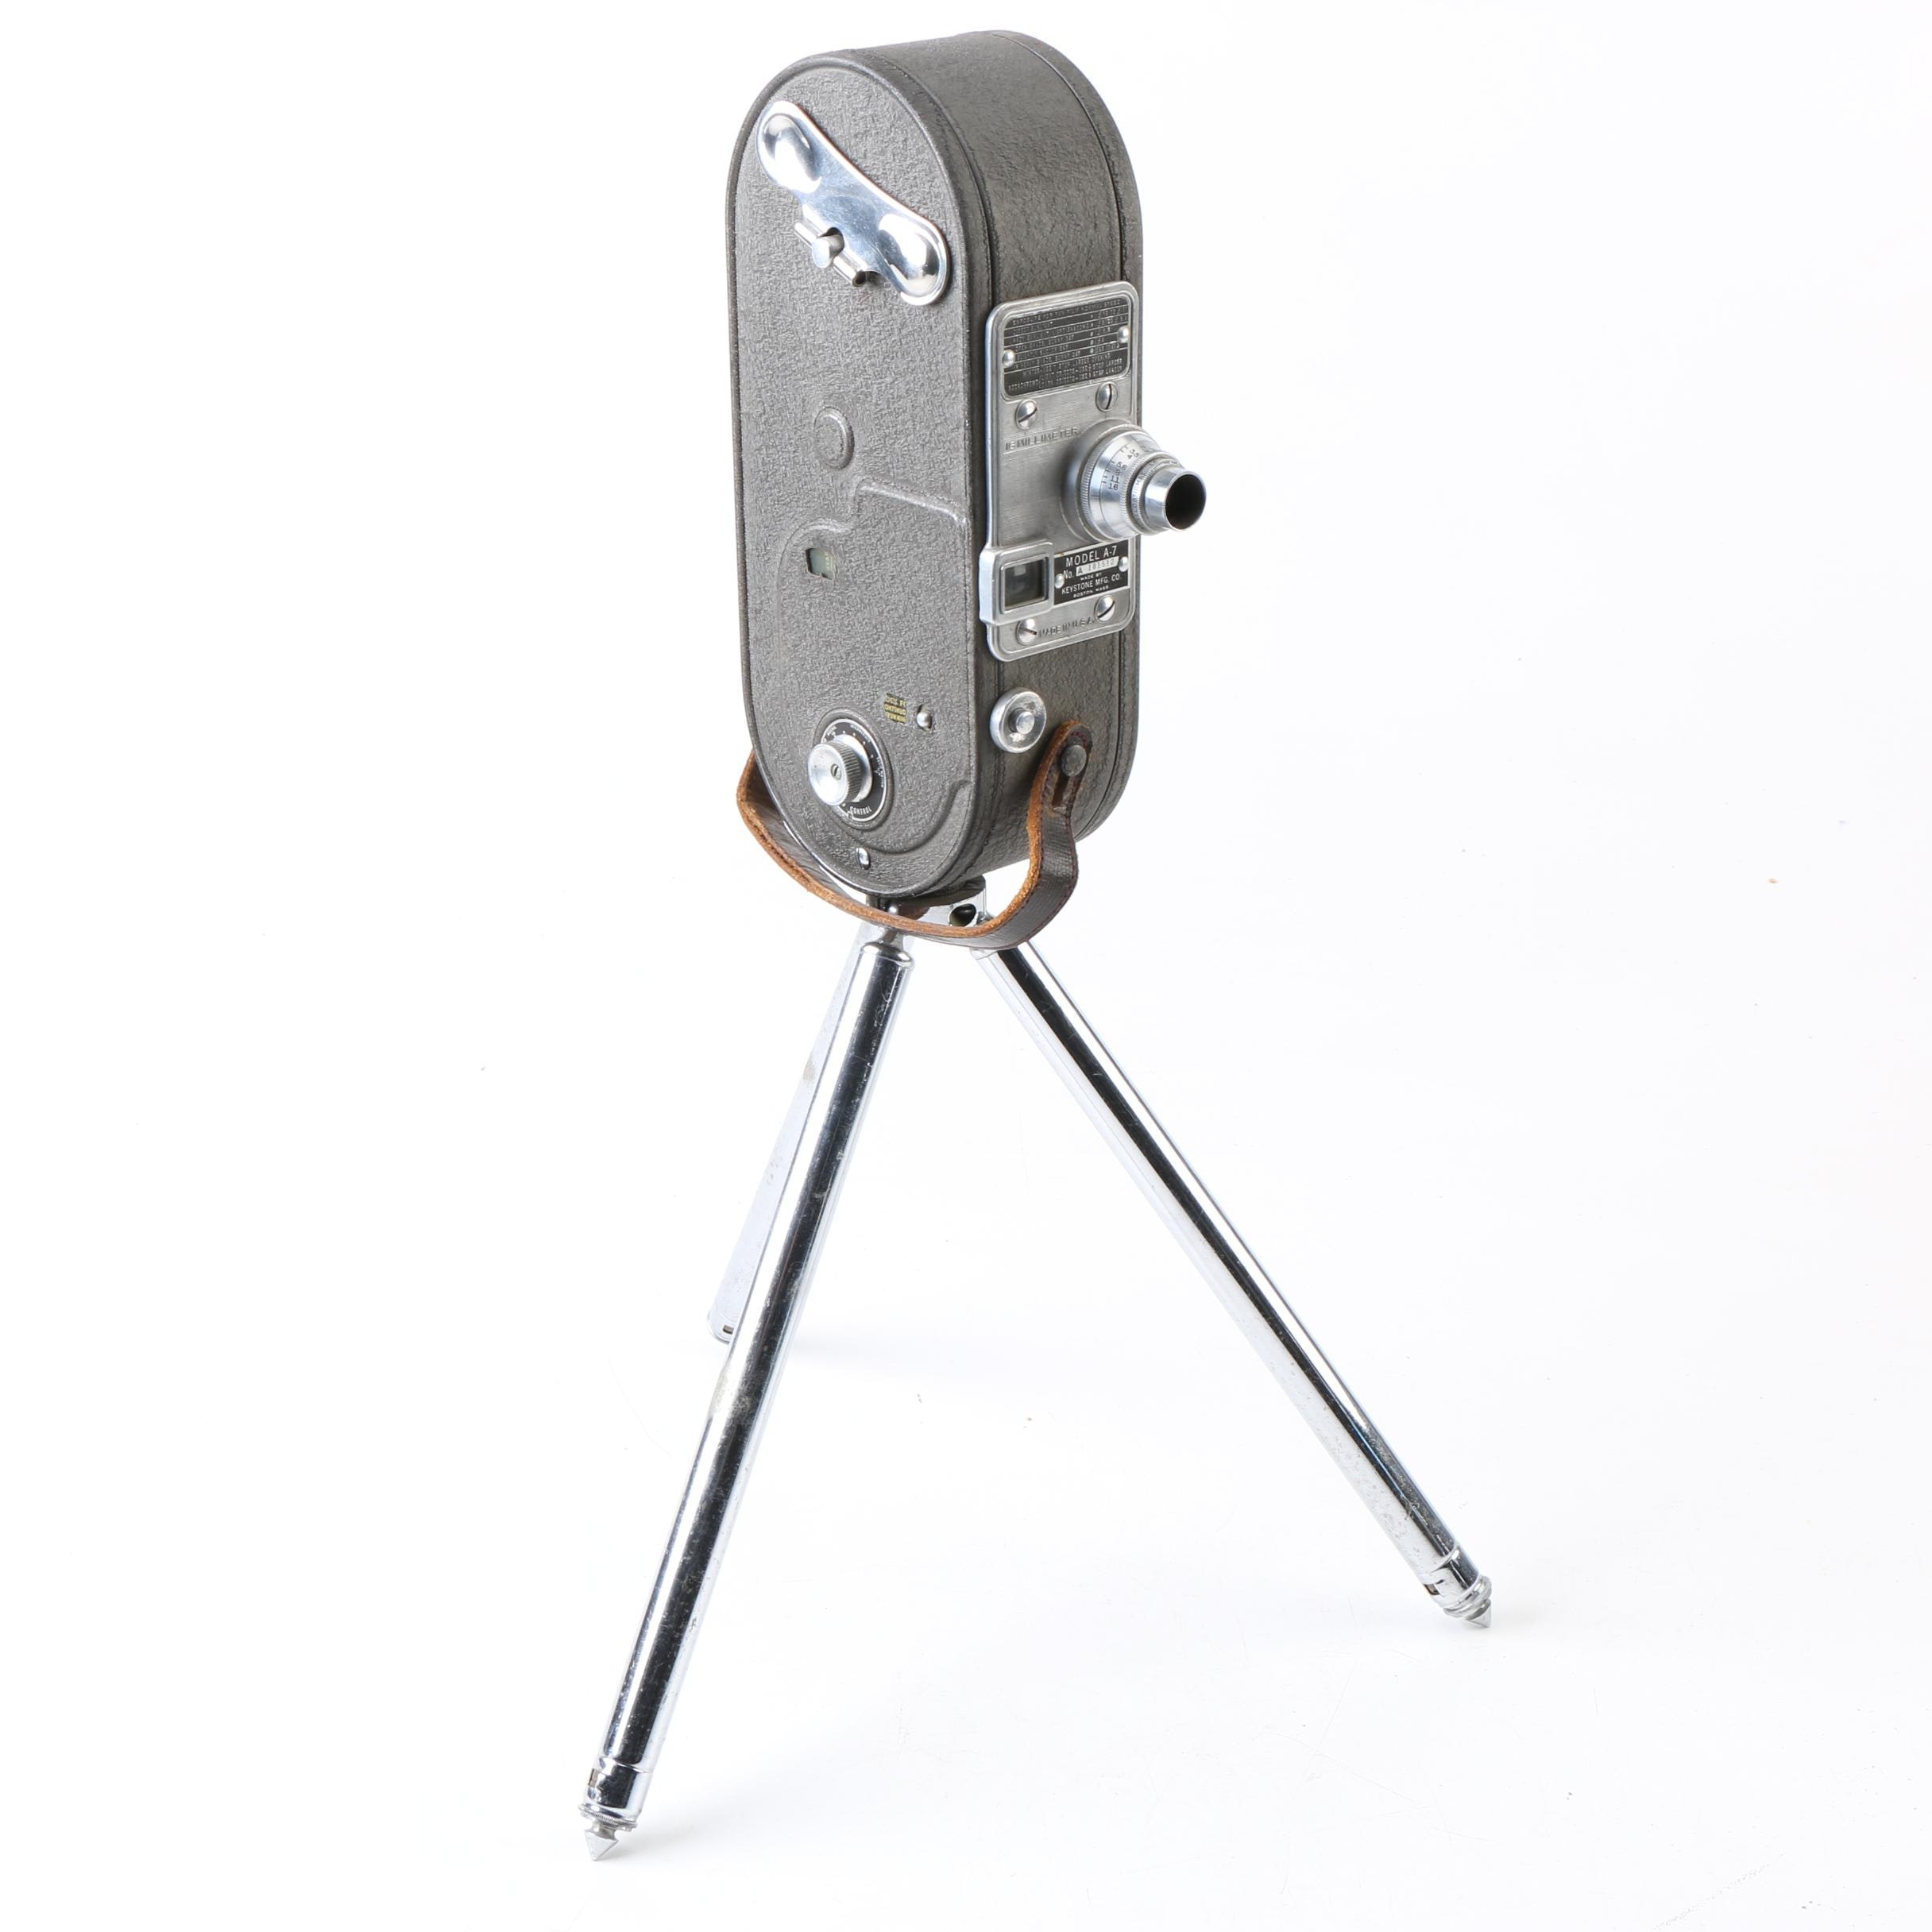 Vintage Keystone A-7 16mm Movie Camera with Tripod